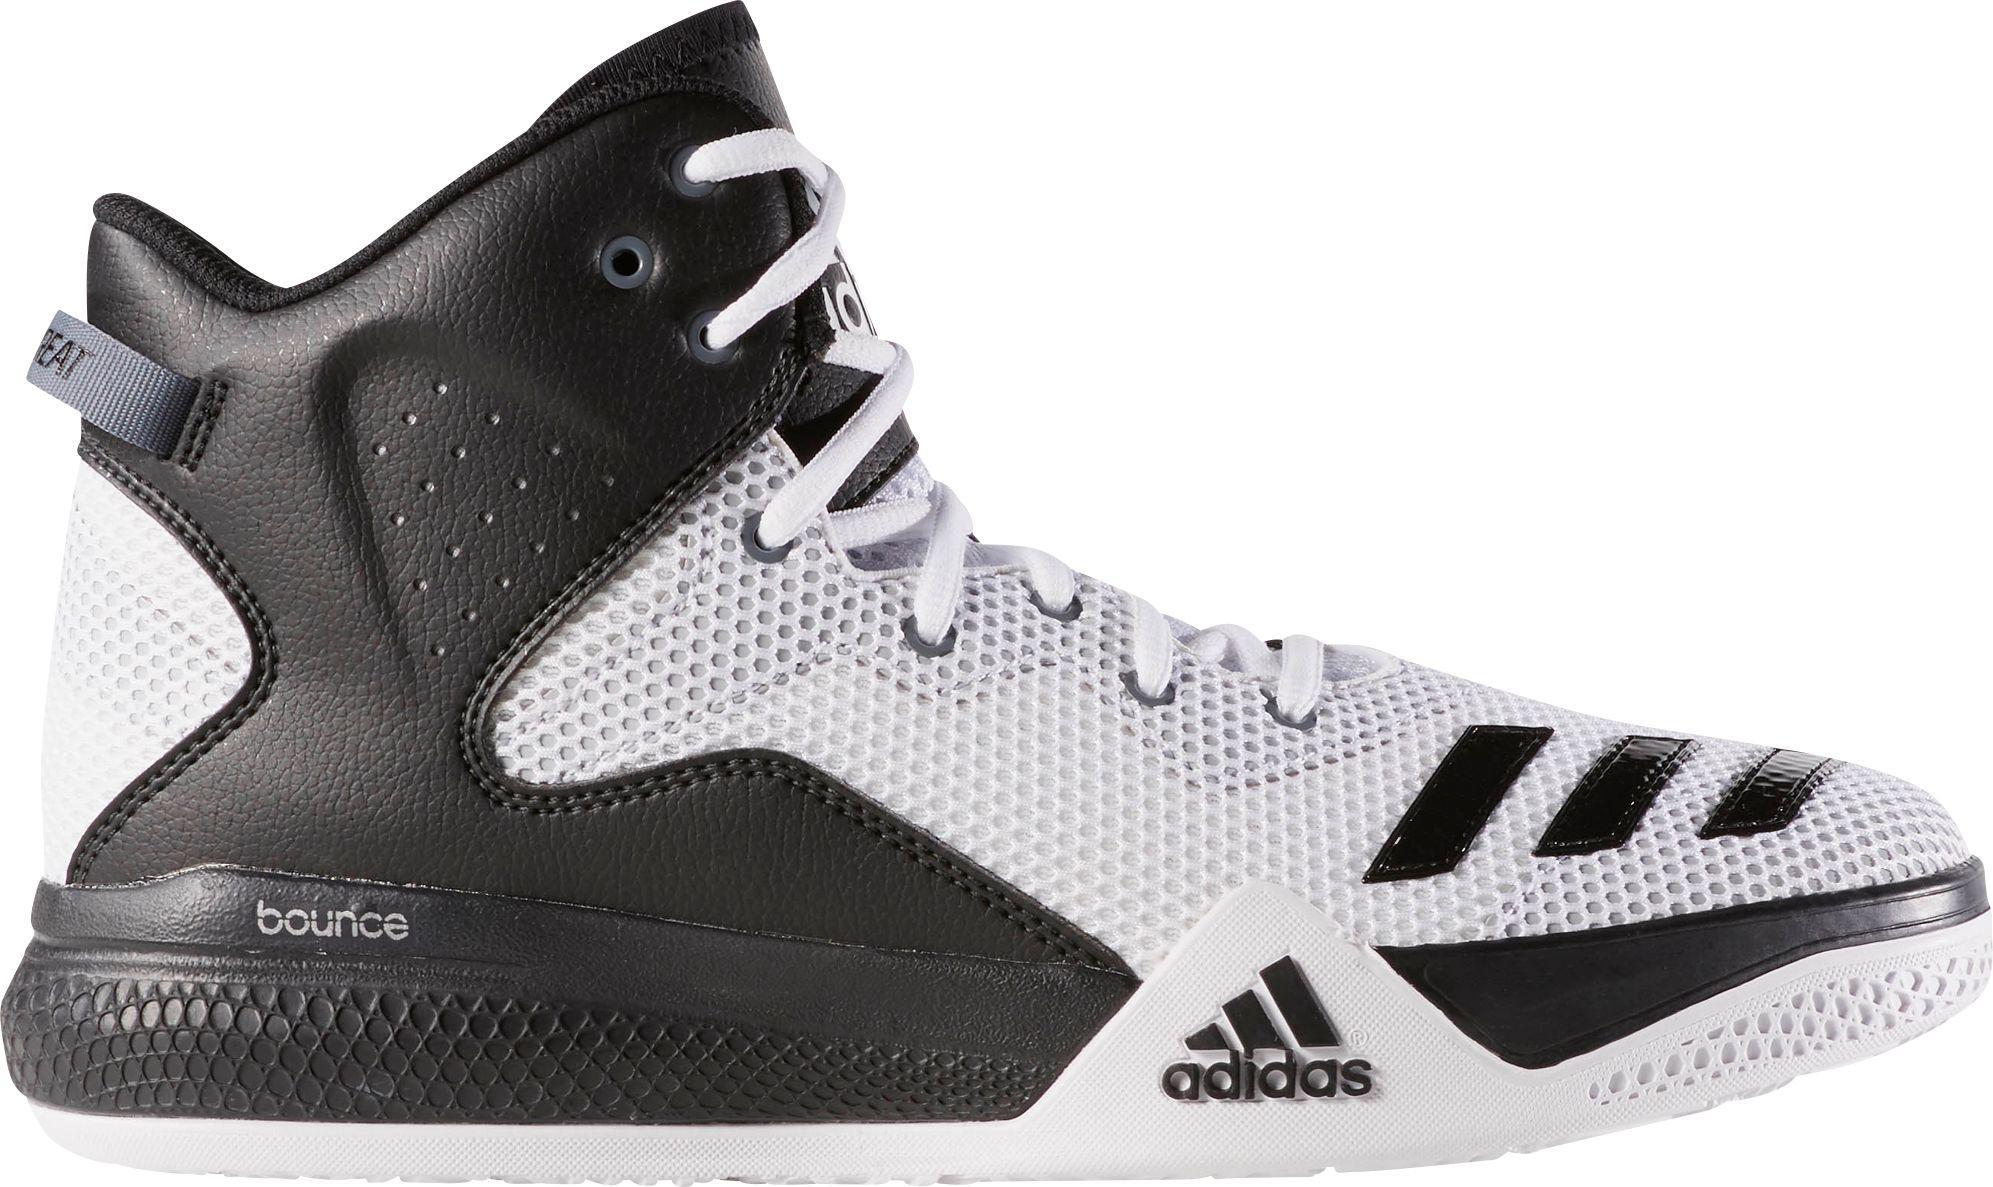 1b61dd1b67d4 adidas Originals Dual Threat Basketball Shoes in White for Men - Lyst